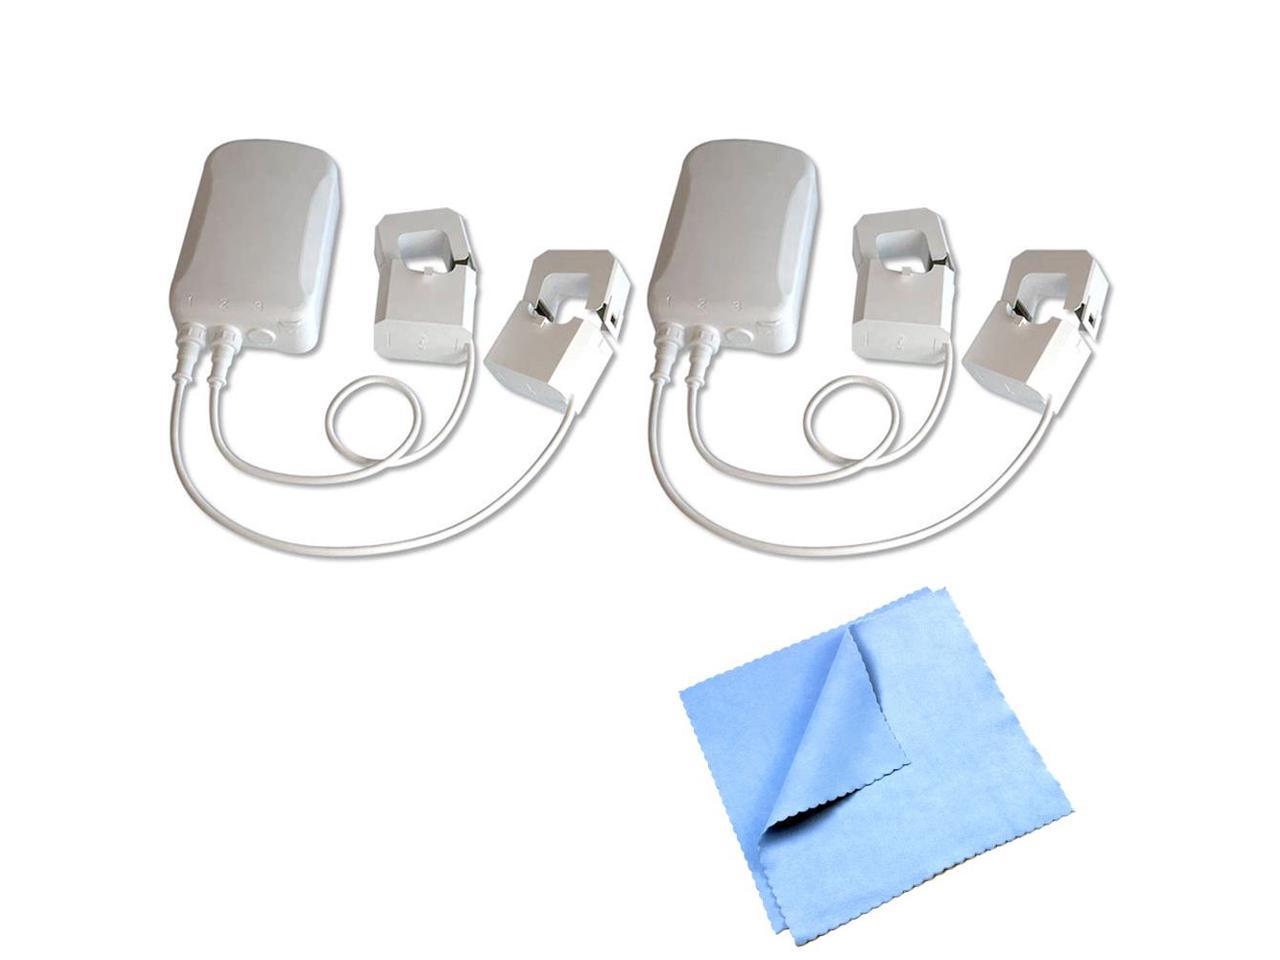 2-Pack Aeon Labs Aeotec Smart/Home Energy Monitor (DSB09104) $24.95 + Free Shipping via Newegg